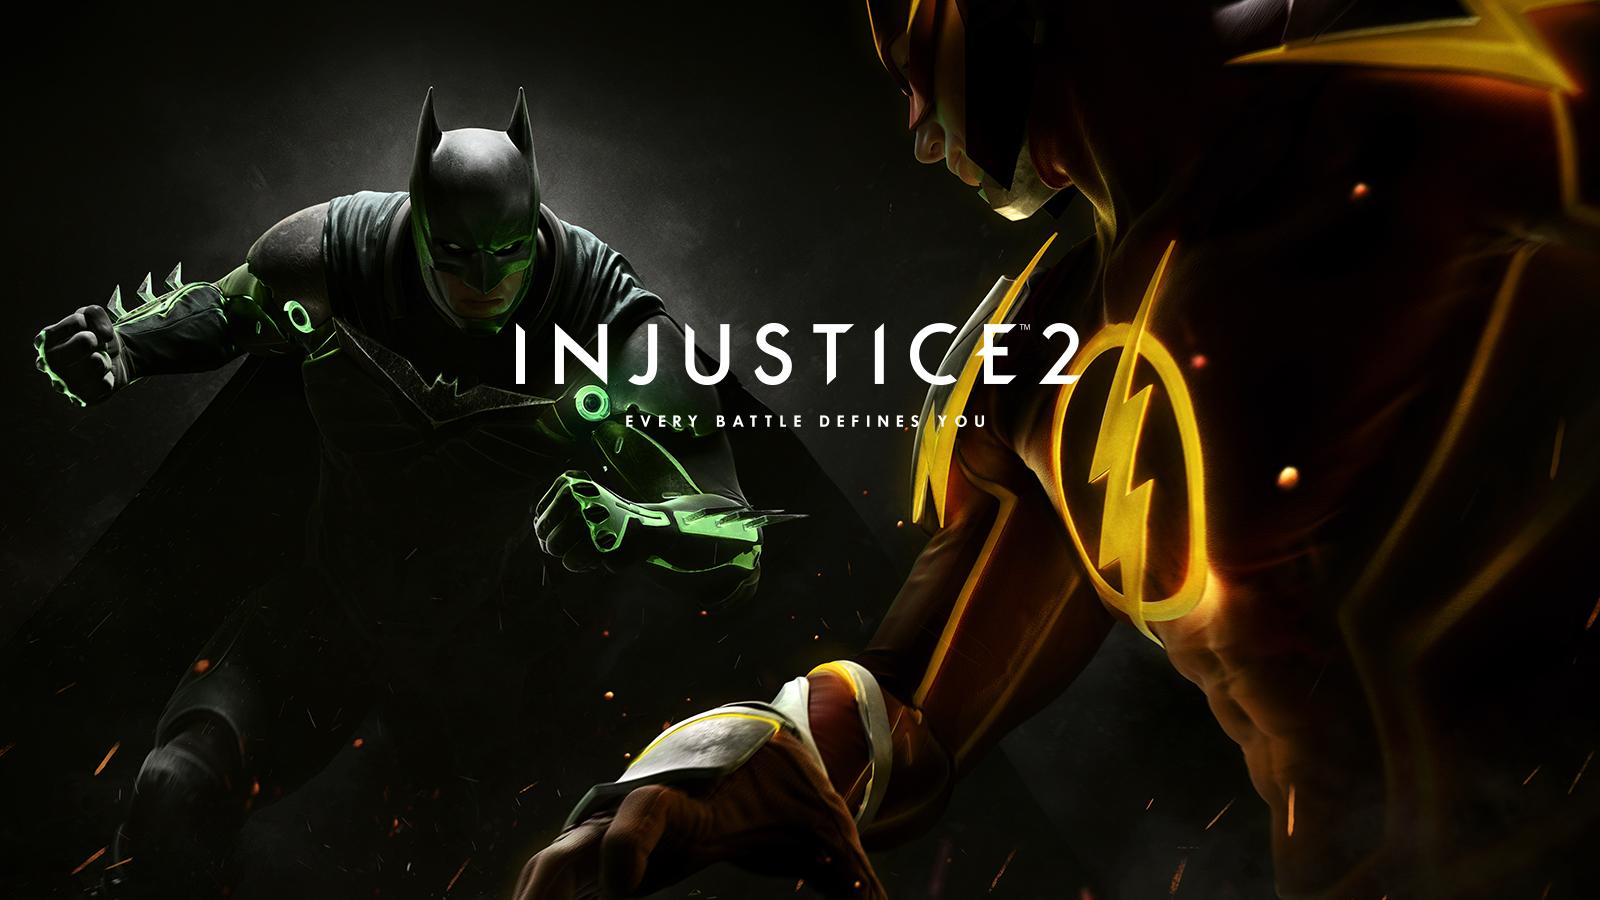 injustice-2-listing-thumb-01-ps4-us-06jun16.png